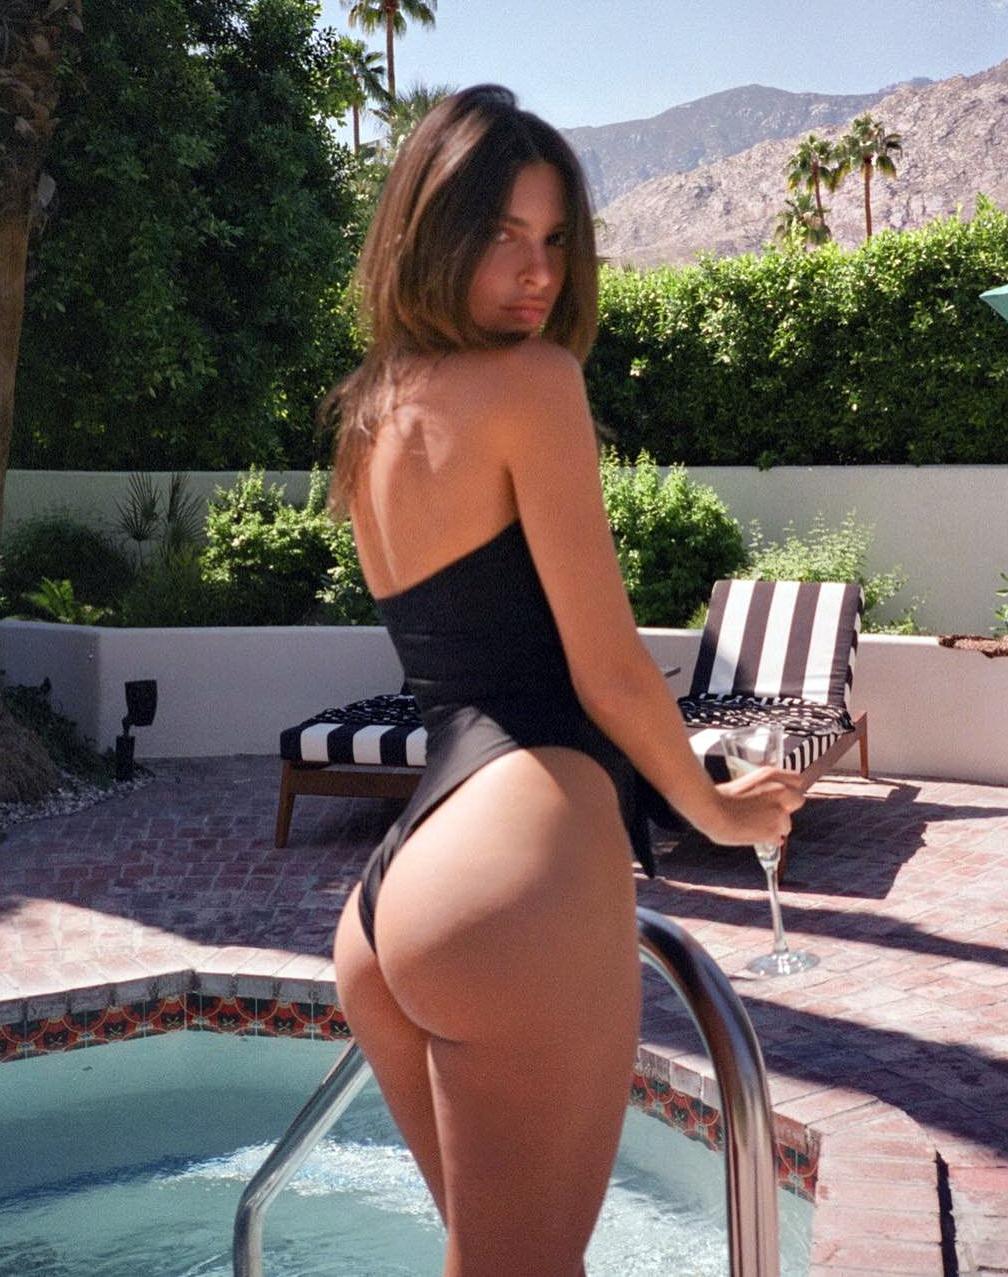 Emily-Ratajkowski-Sexy-Hot-1-thefappeningblog.com_.jpg